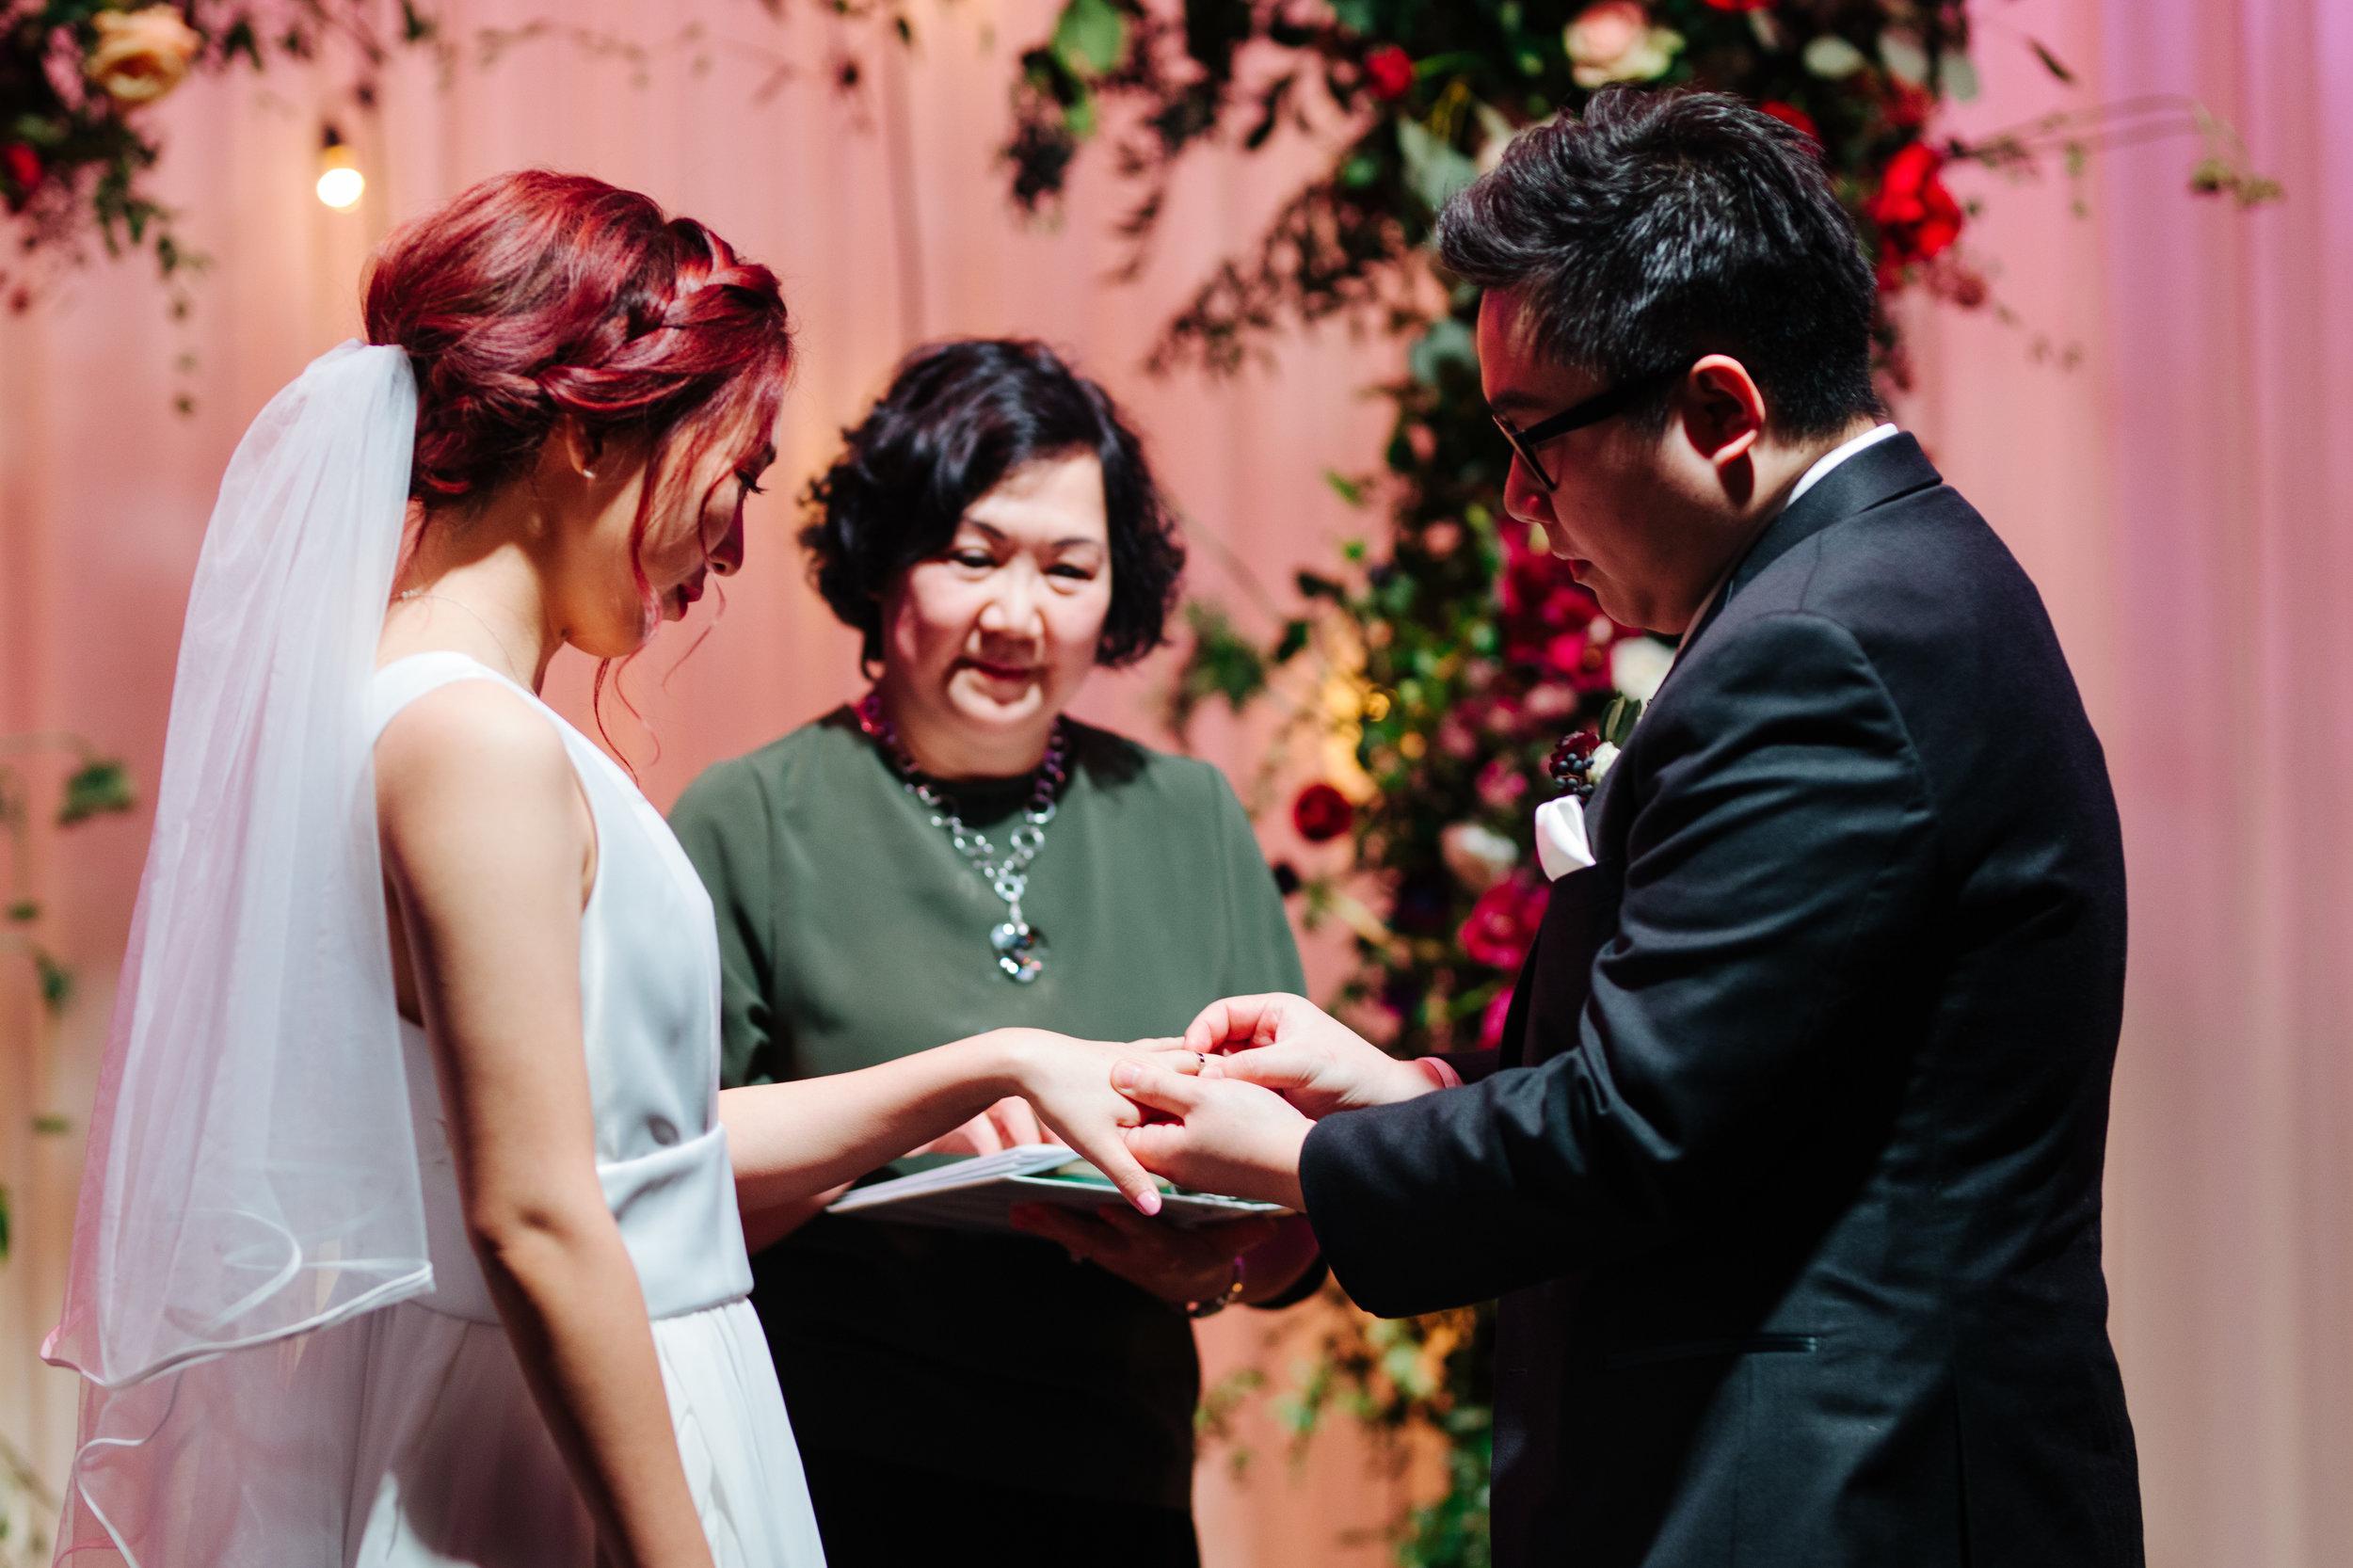 herastudios_event_bride_groom_hera_selects_preview-9.jpg